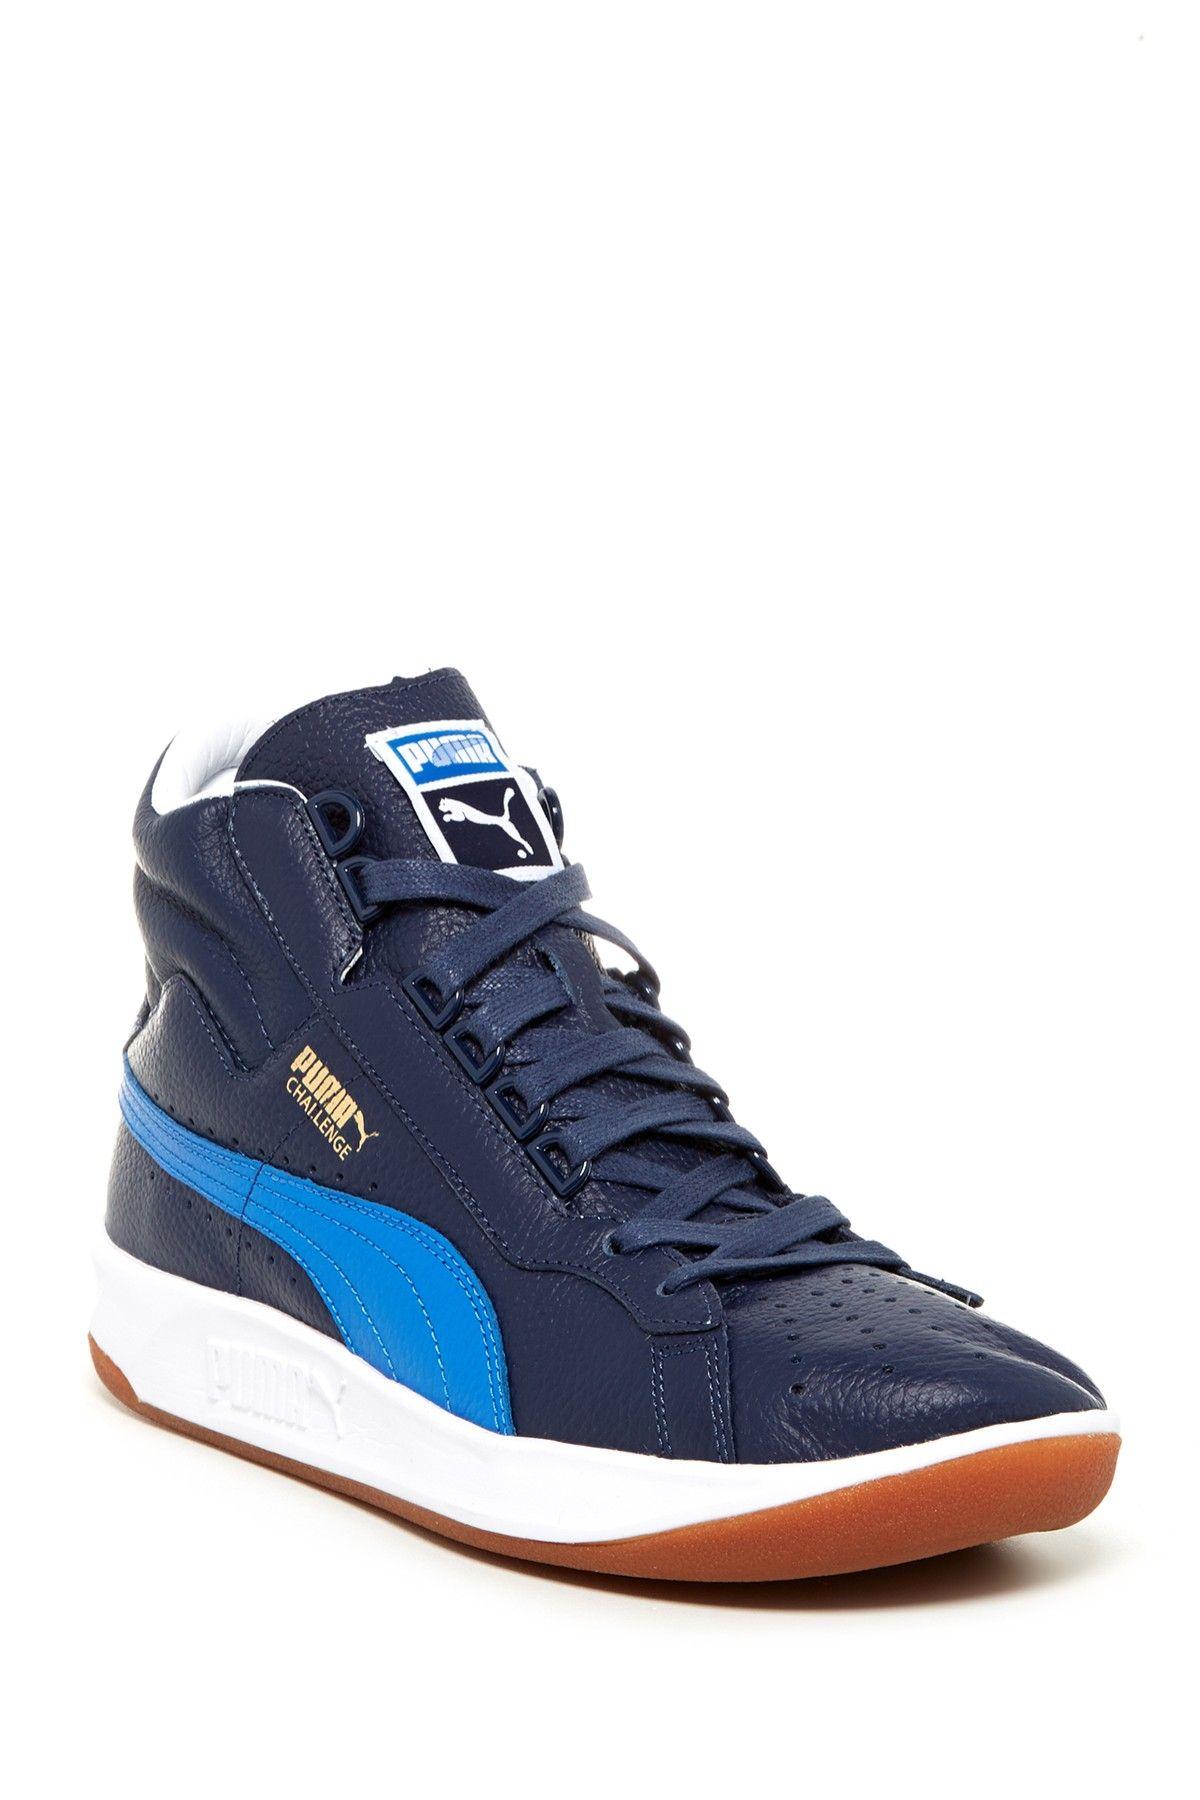 5c6f45b3a89 Puma Challenge Advantage  Blue